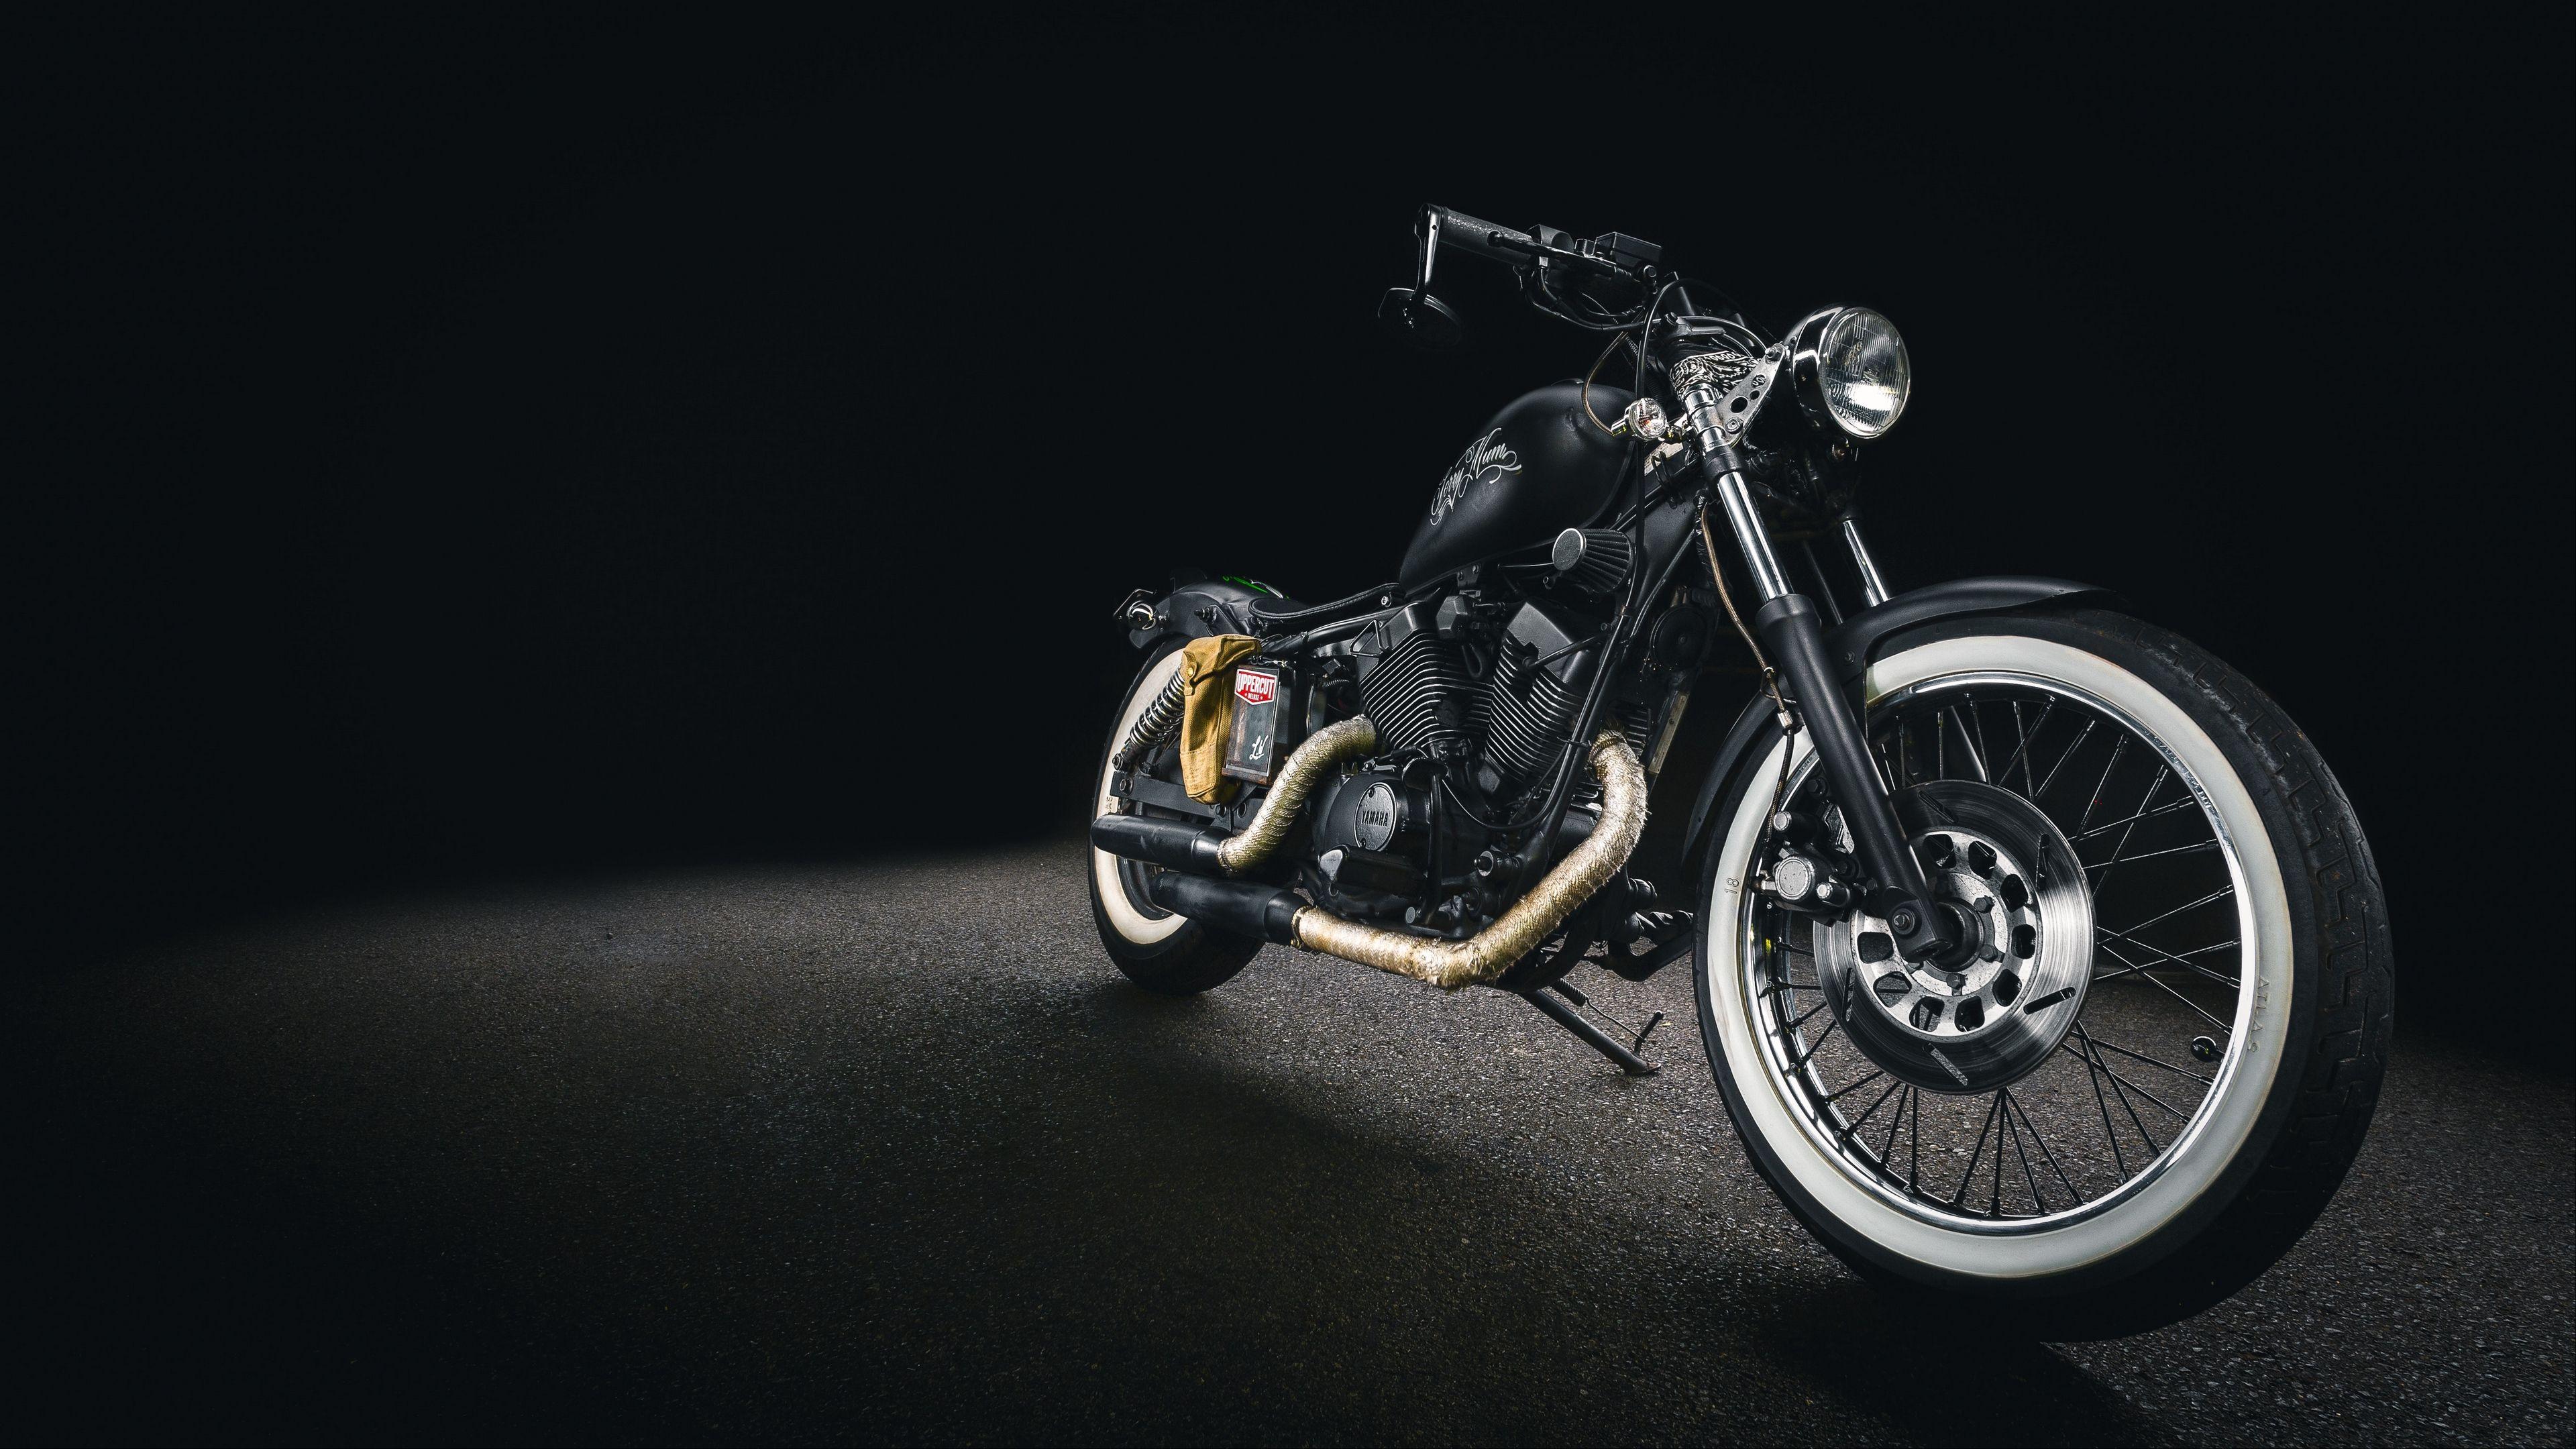 Motorcycle Bike Wheel 4k 4k Hd Wallpapers Motorcycle Bike Hd Motorcycles Hd wallpaper gray black motorcycle bike